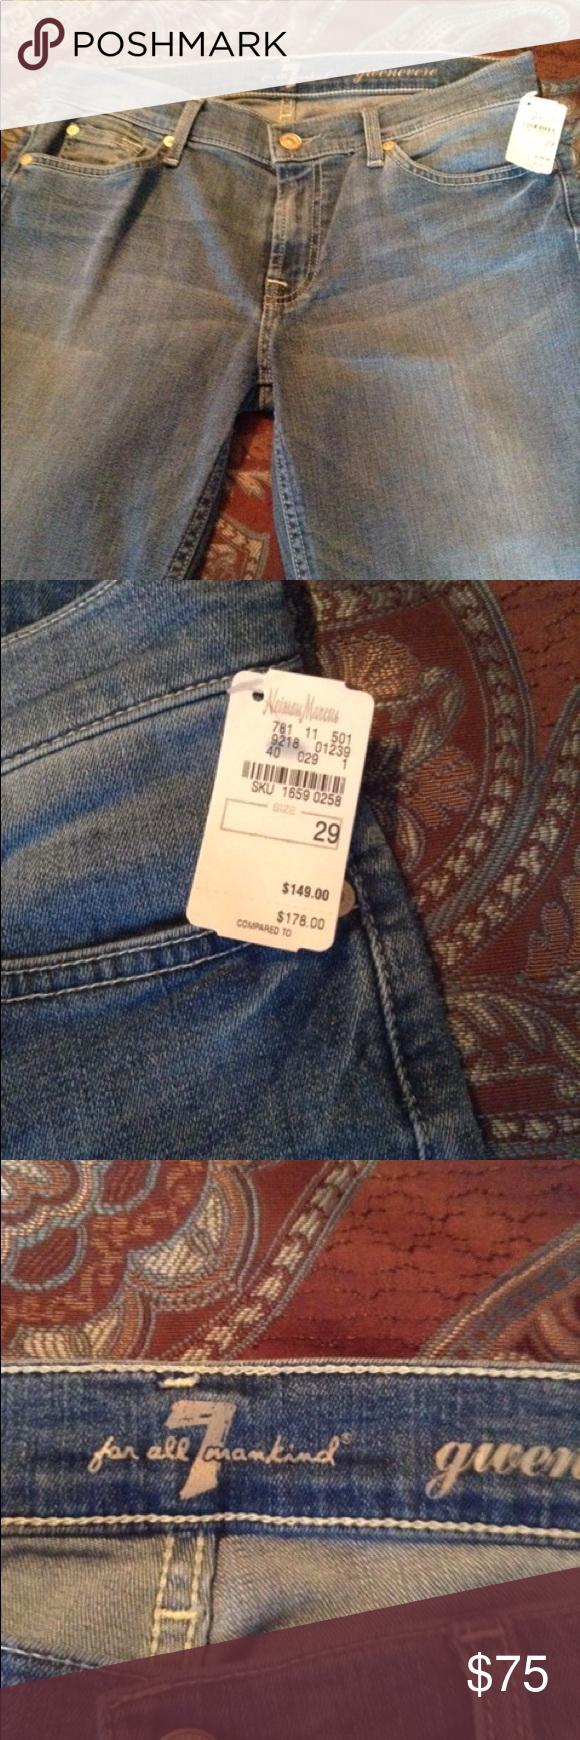 7 For All Man Kind Jeans 7 For All Man Kind Jeans 7 For All Mankind Pants Straight Leg